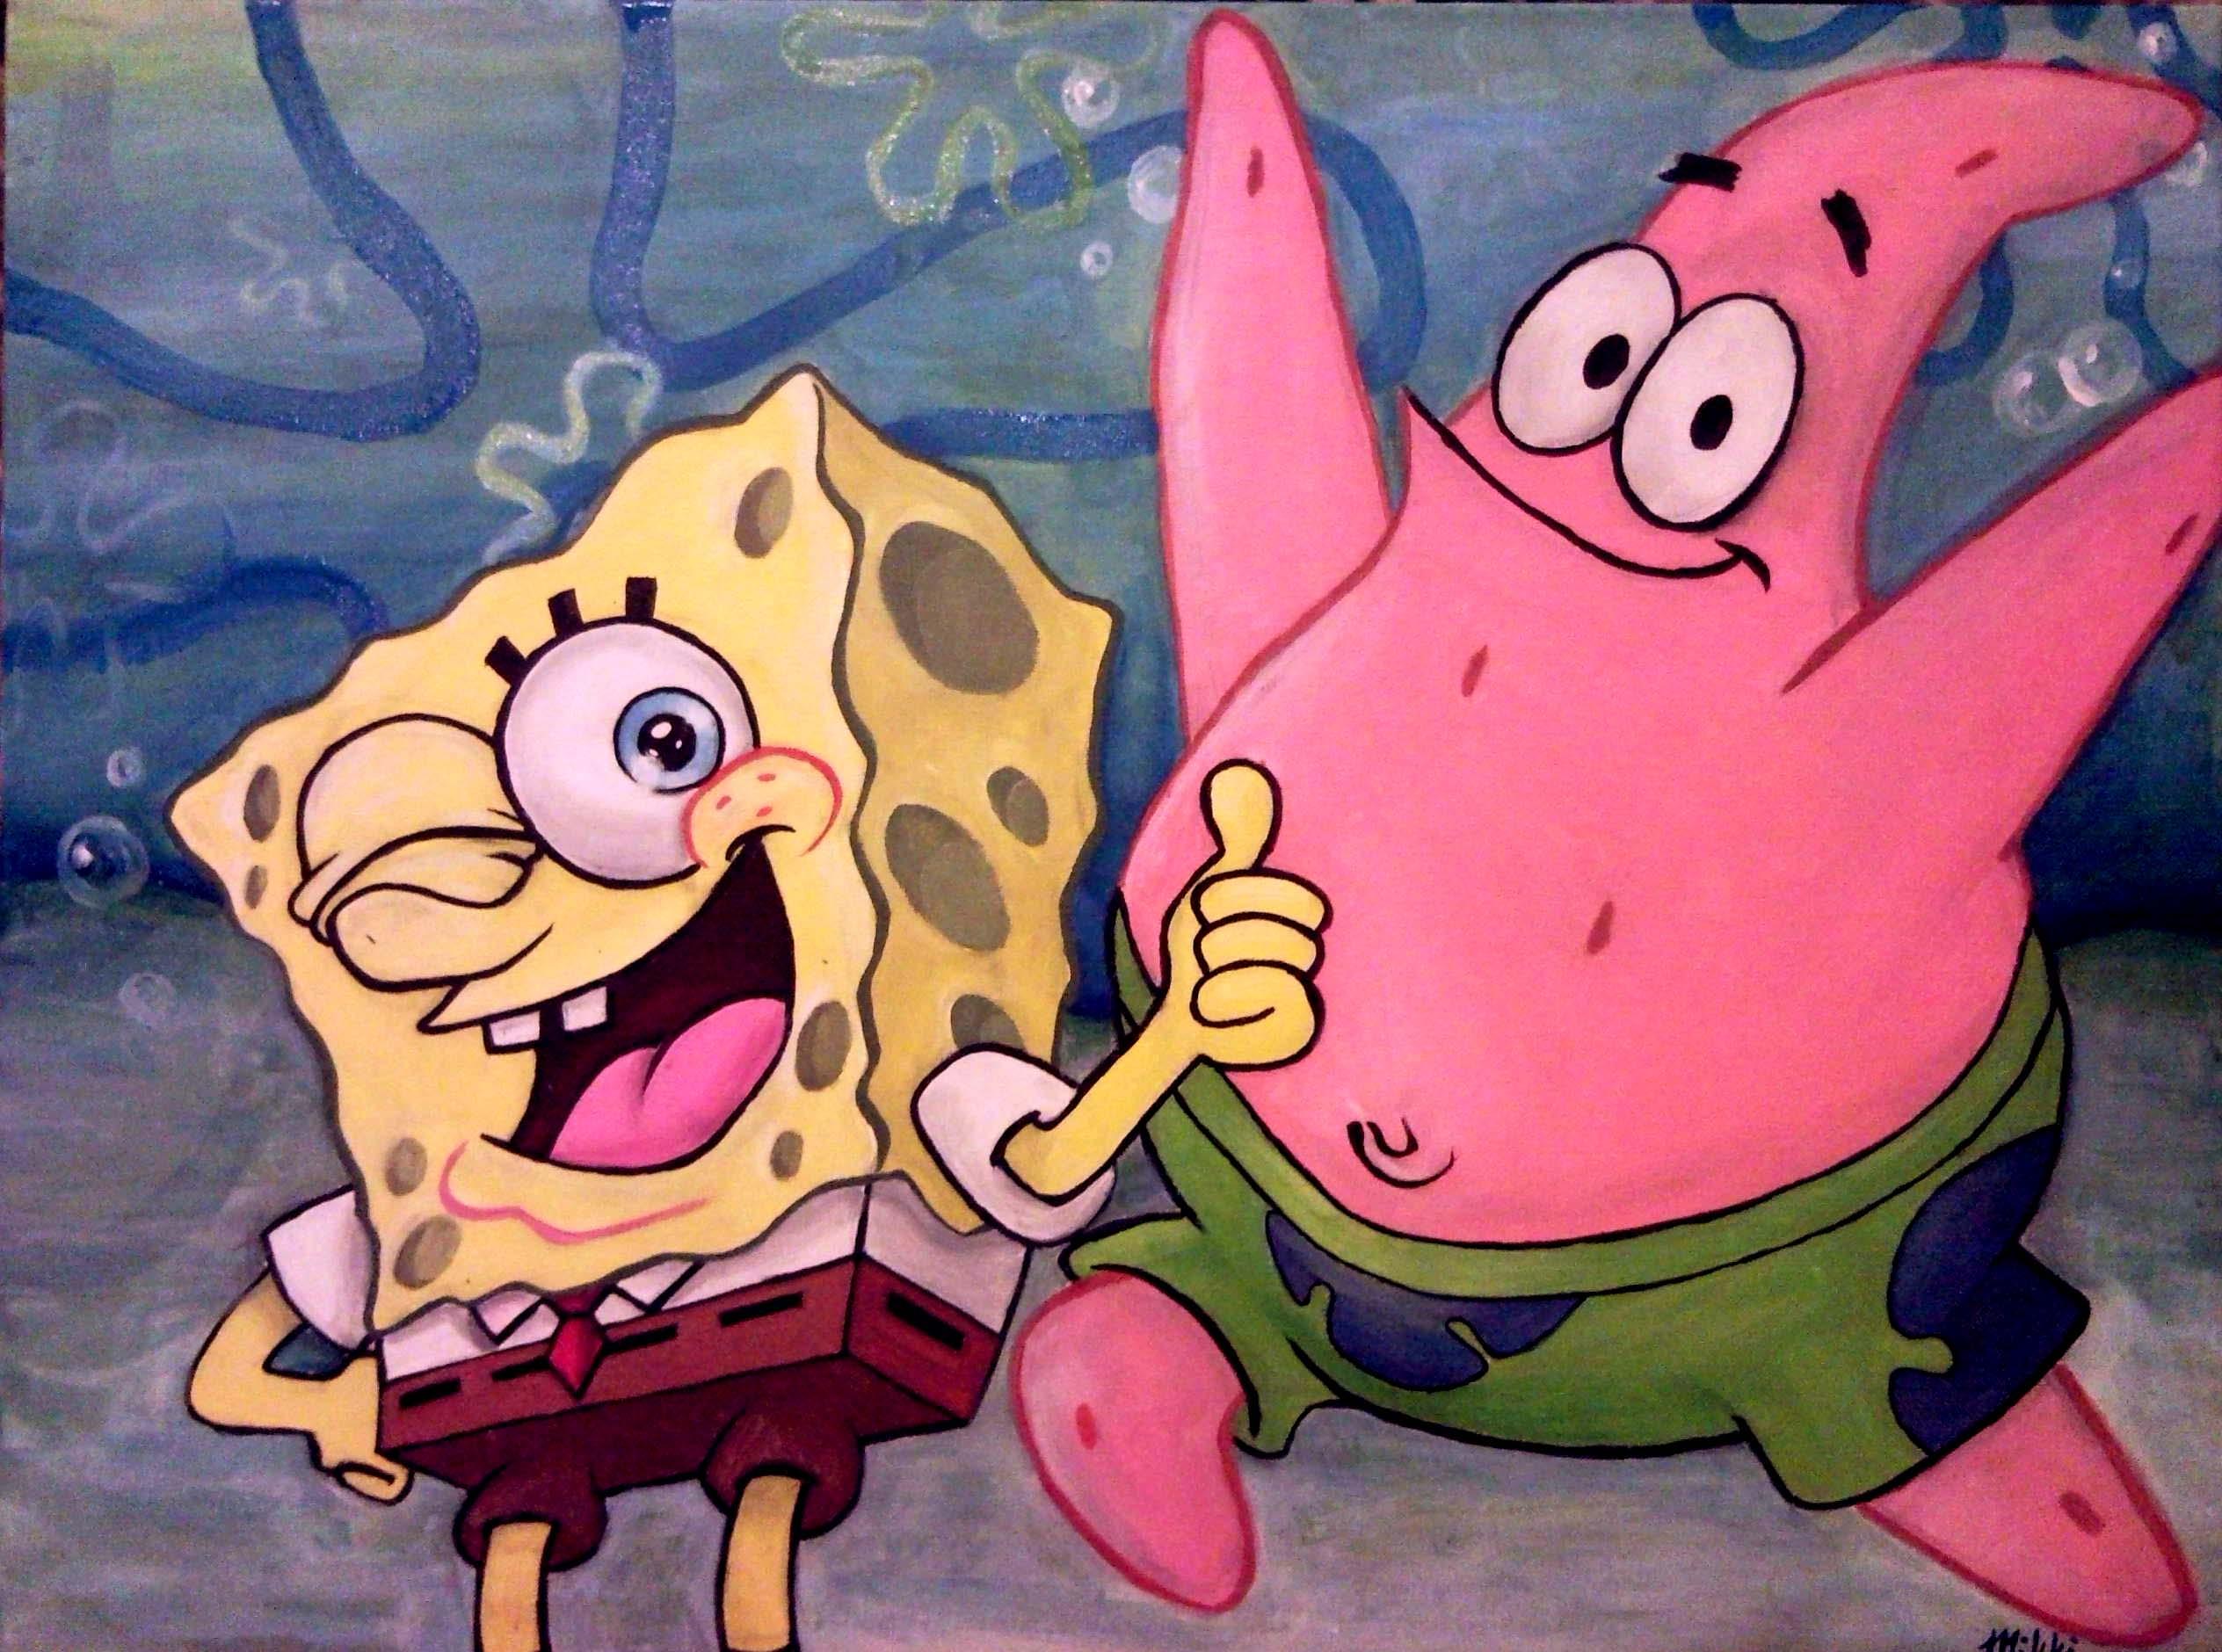 spongebob and patrick by karmaela on deviantart